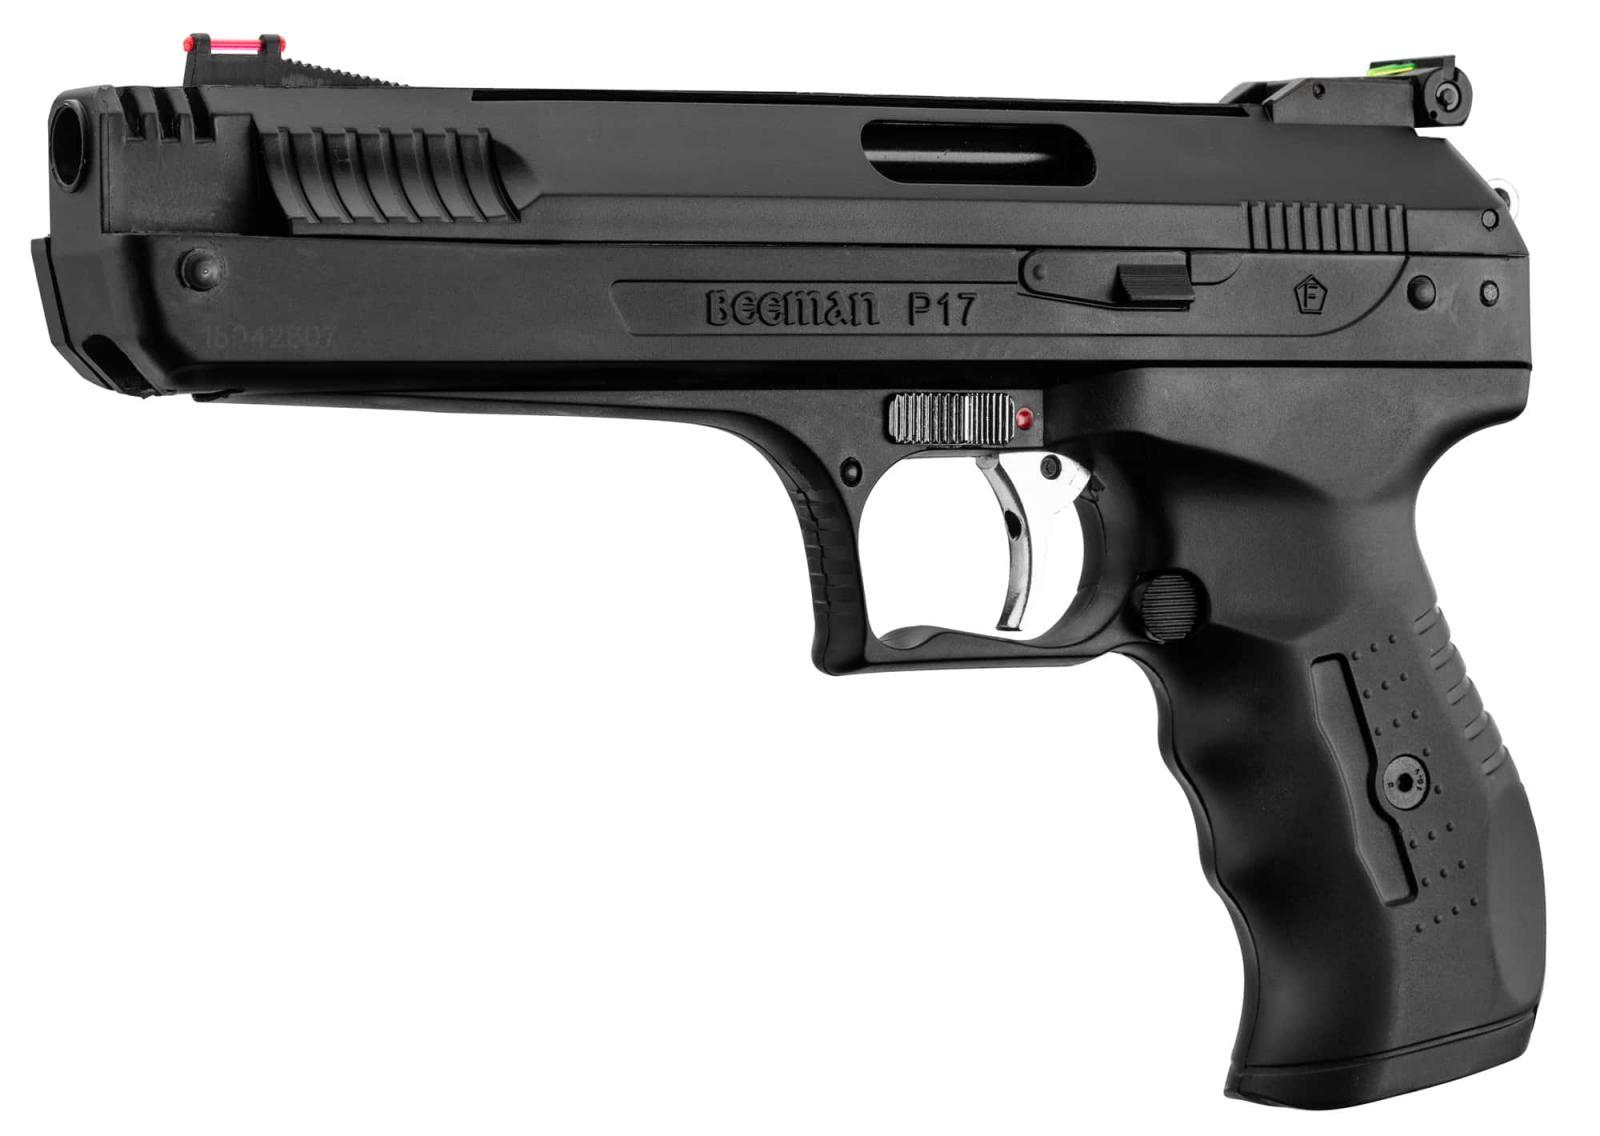 Pistolet à air comprimé BEEMAN P17 cal. 4.5 mm - 3.7 J